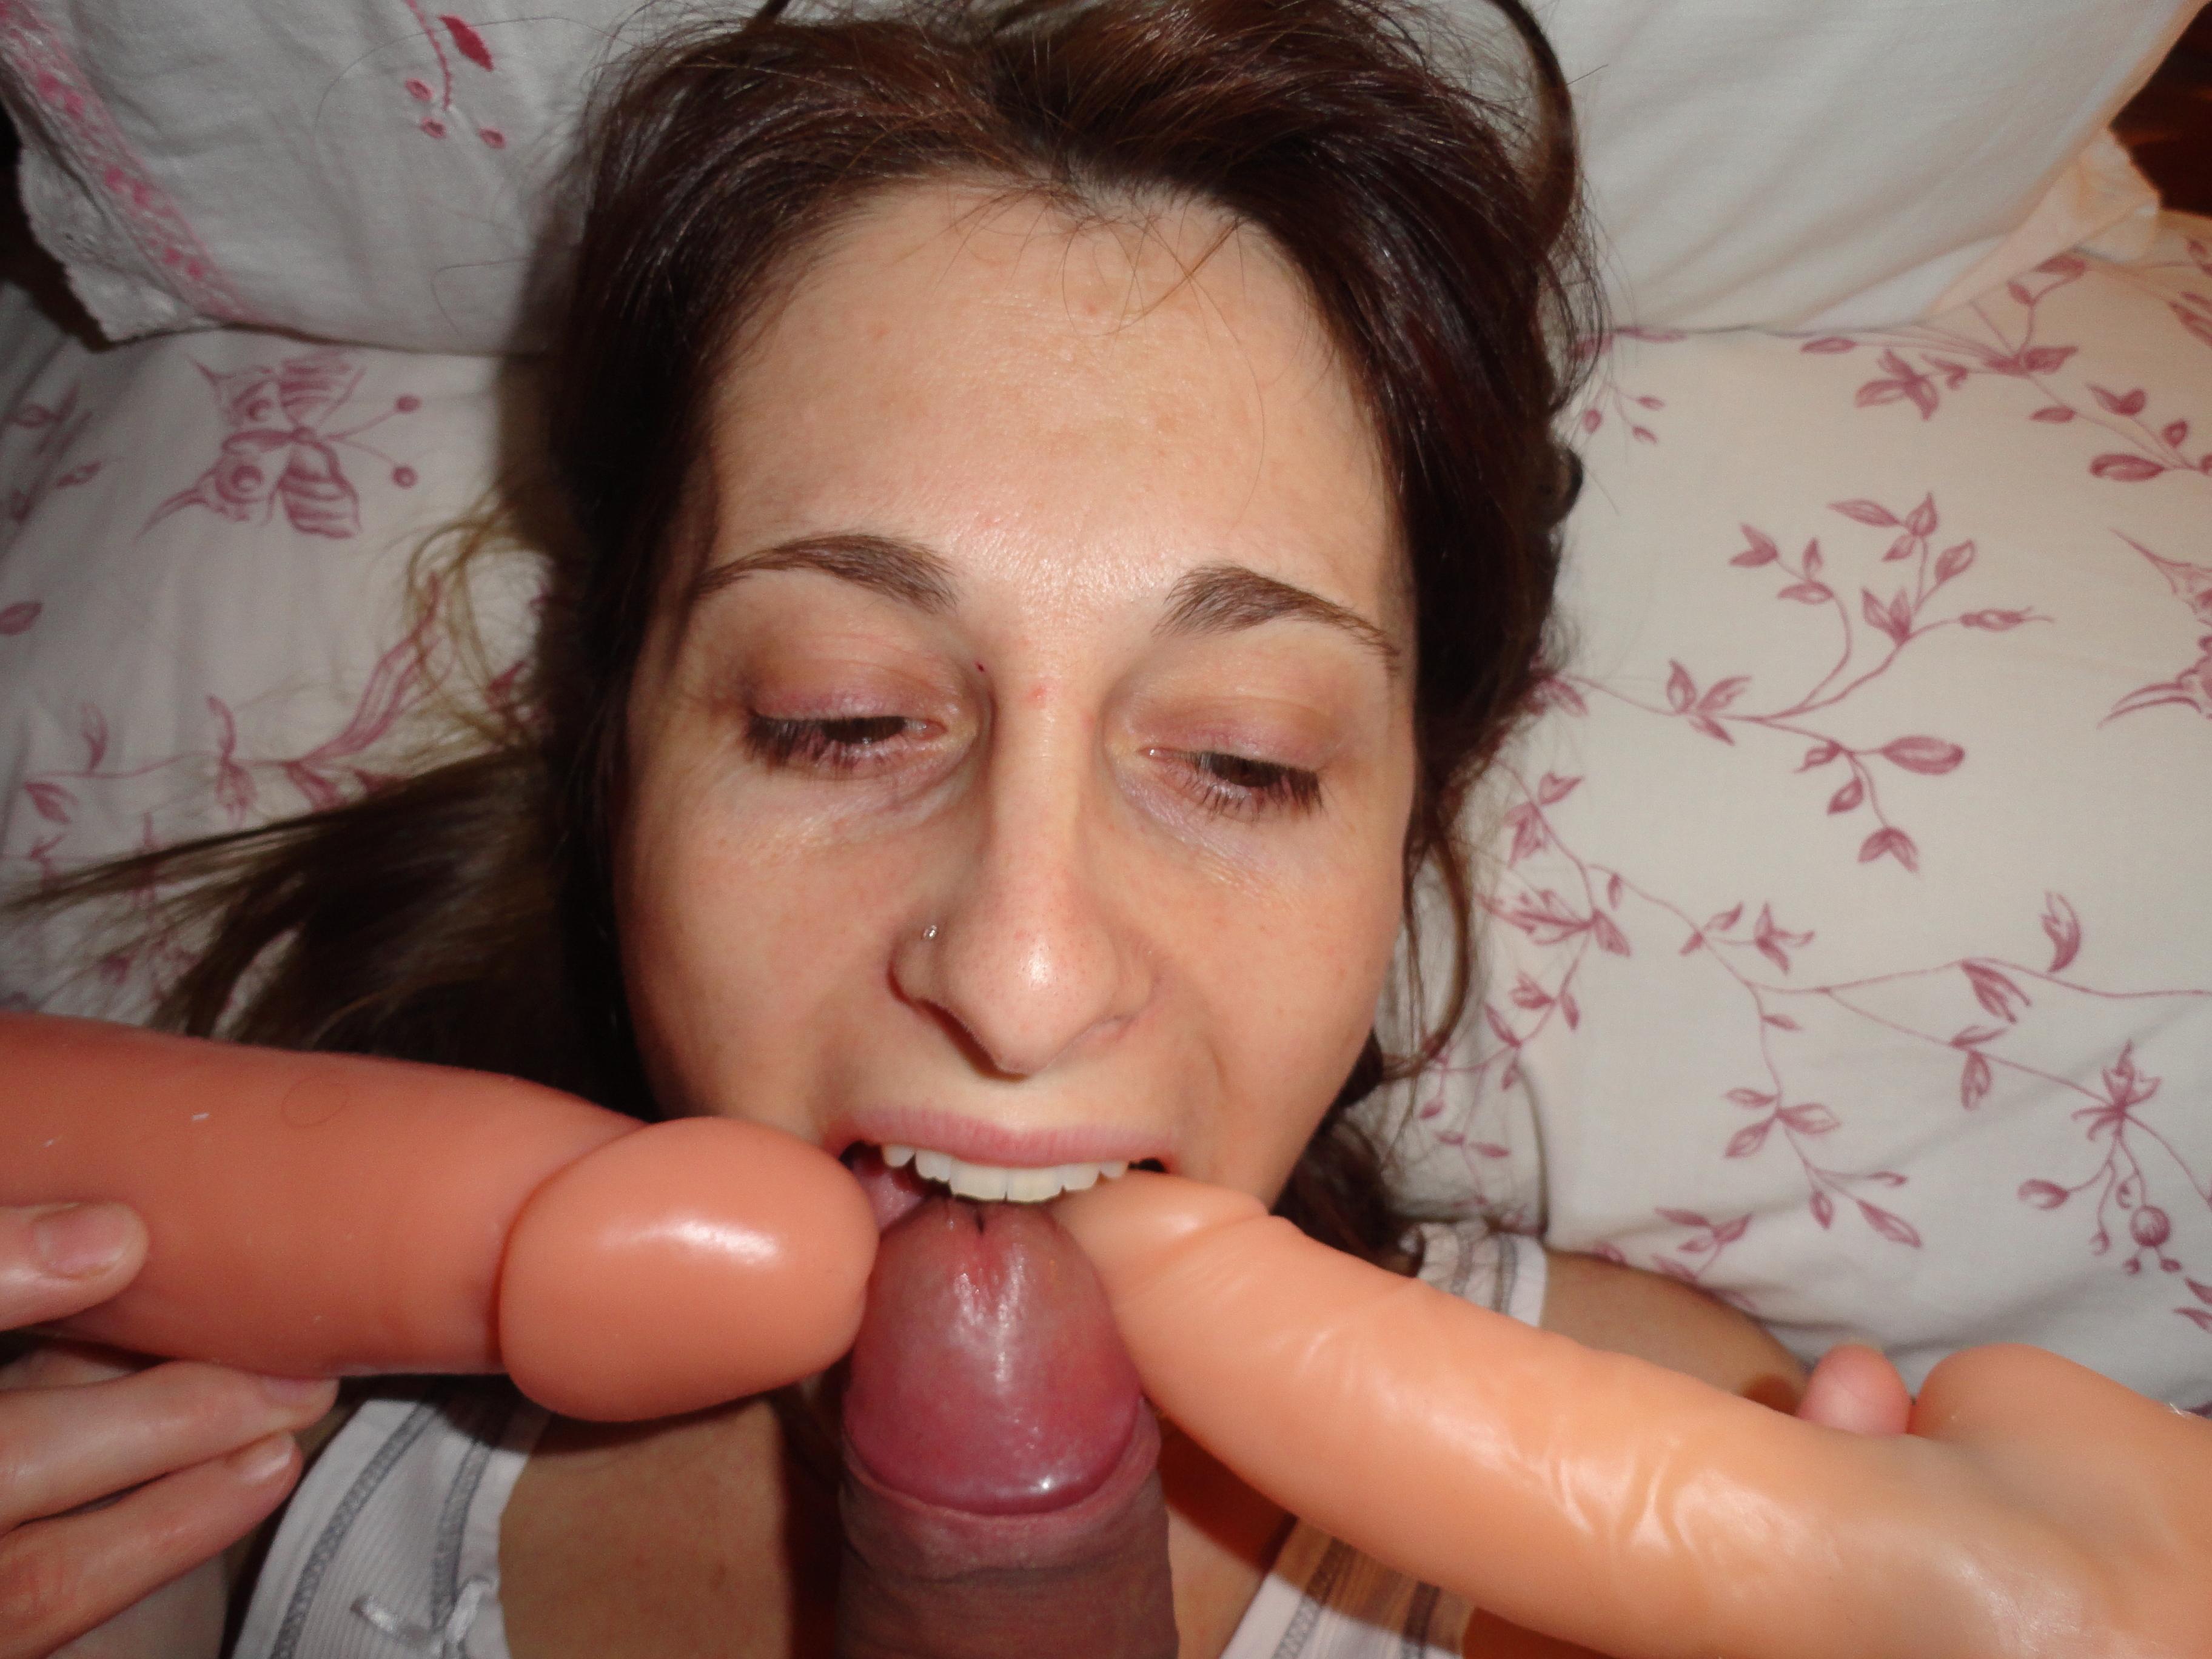 Bizzare porn wallpaper erotic gallery